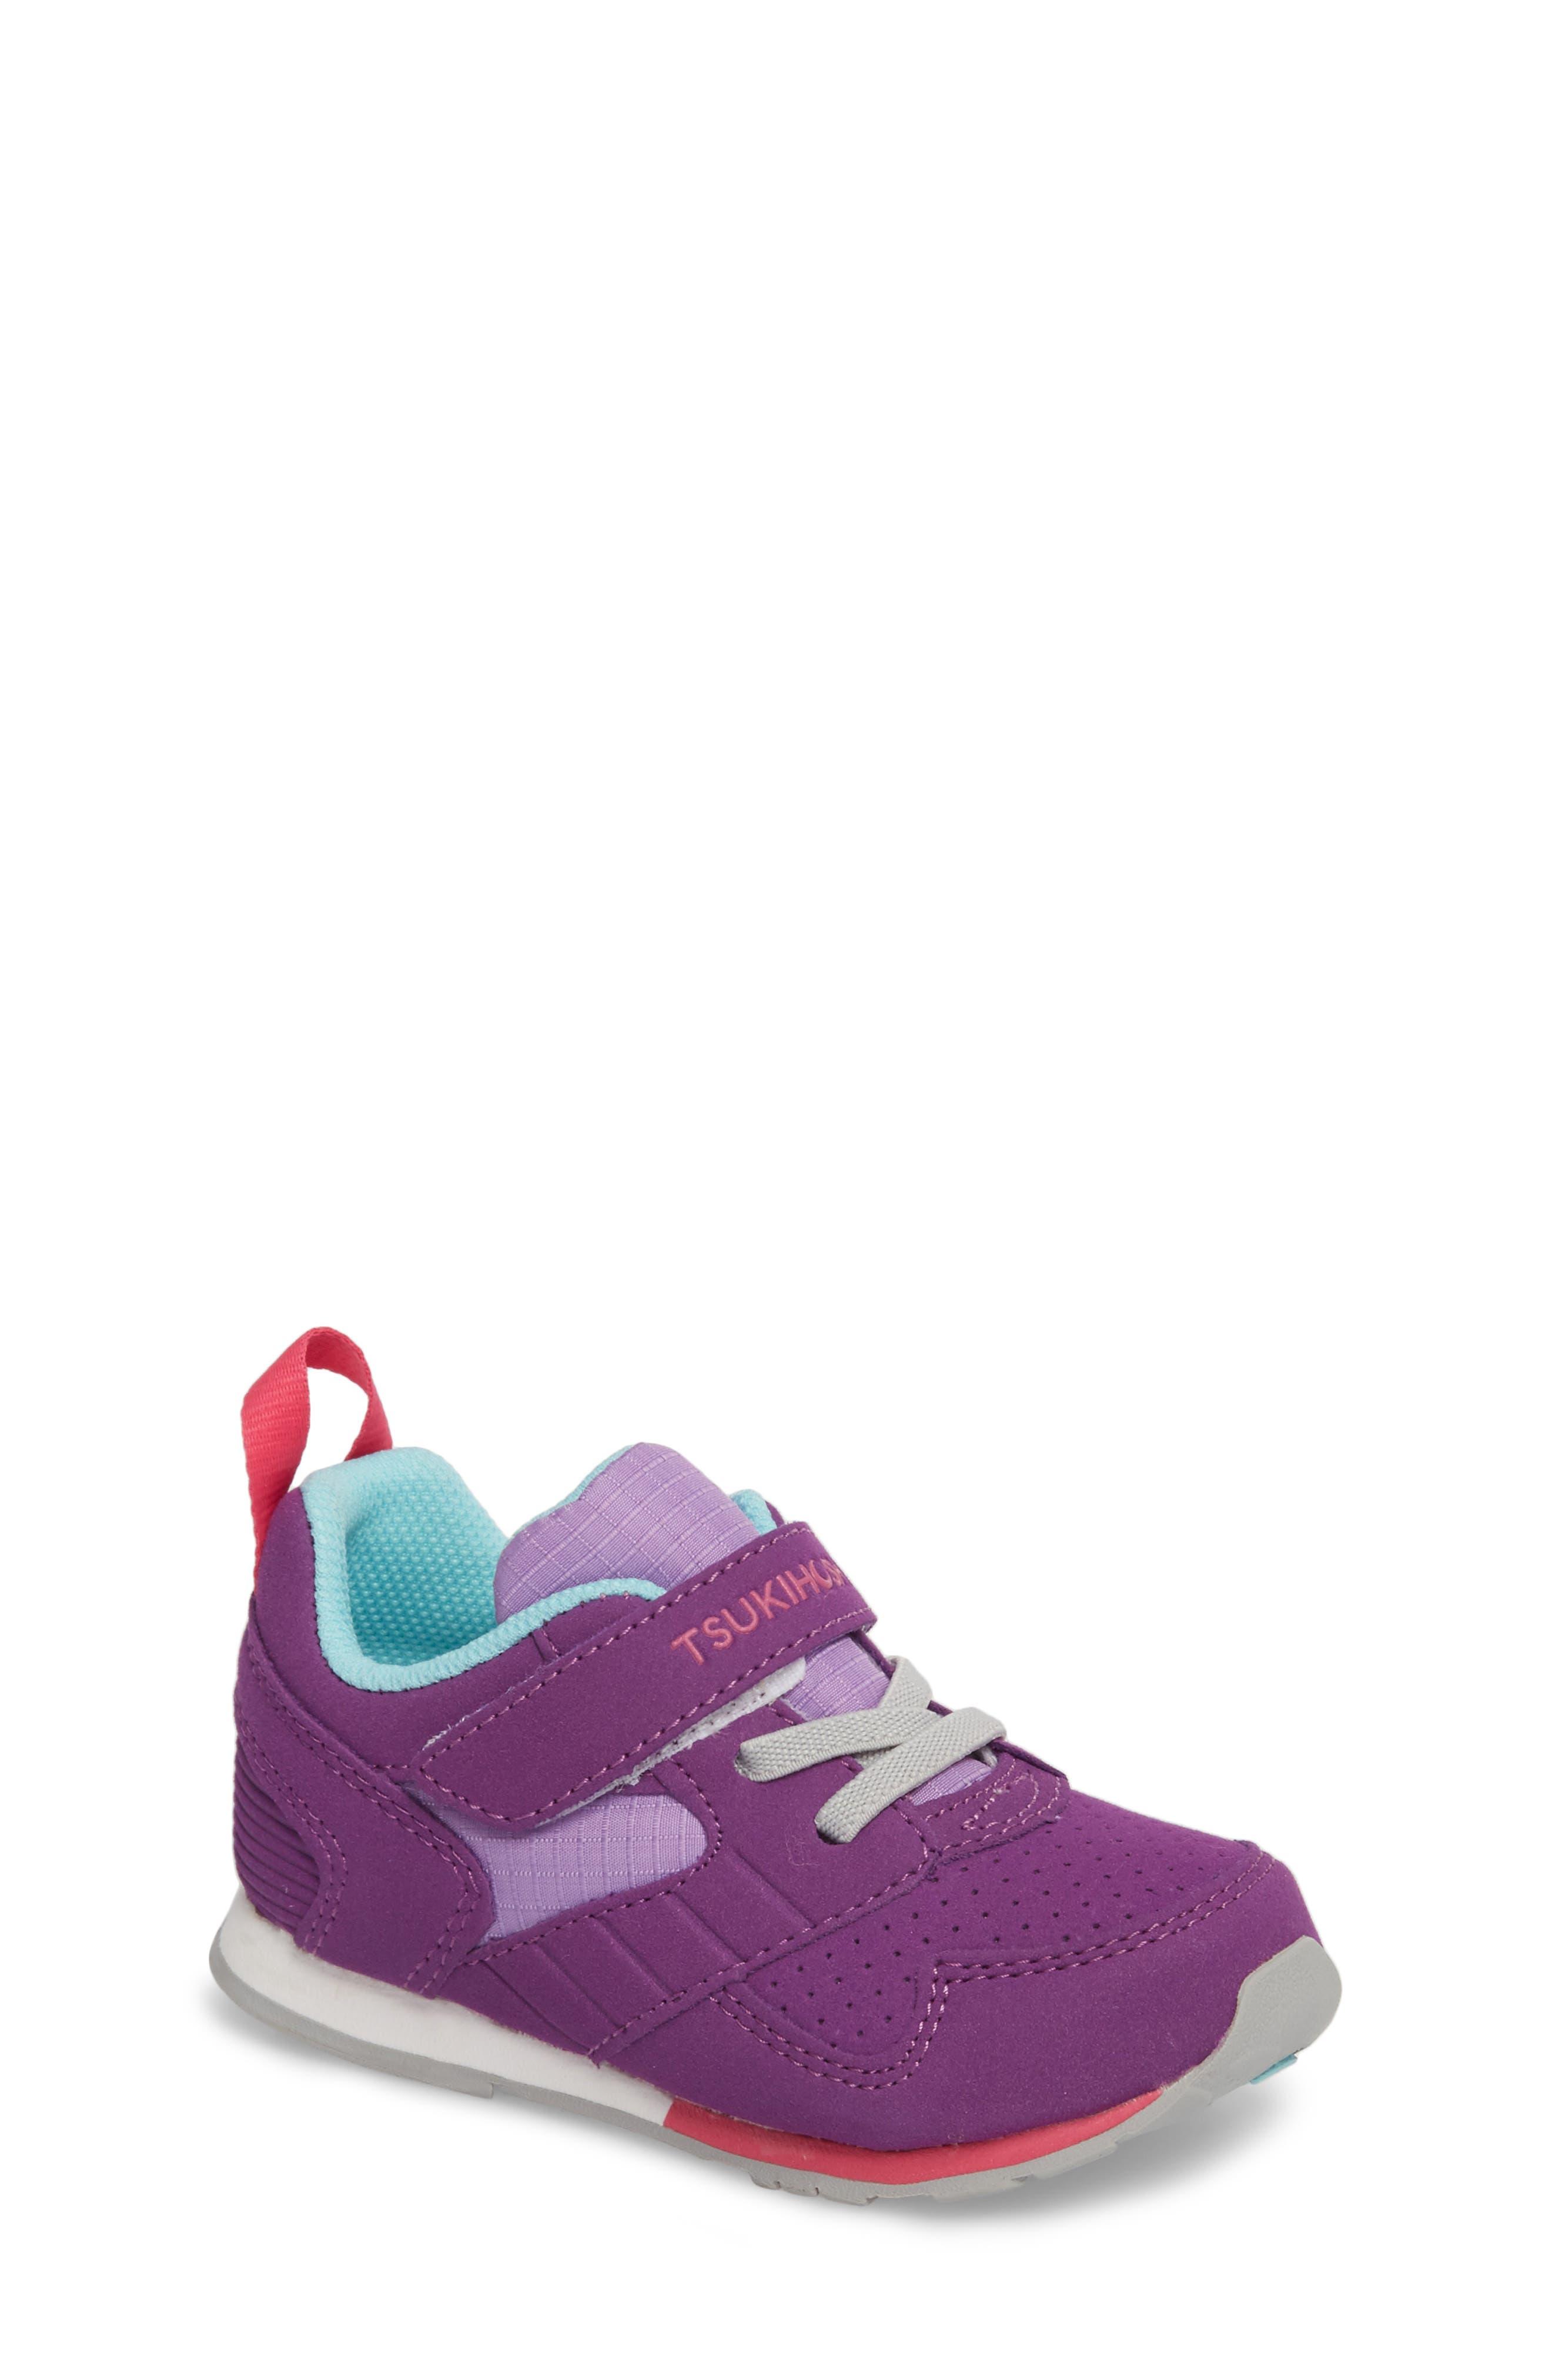 Main Image - Tsukihoshi Racer Washable Sneaker (Walker, Toddler & Little Kid)